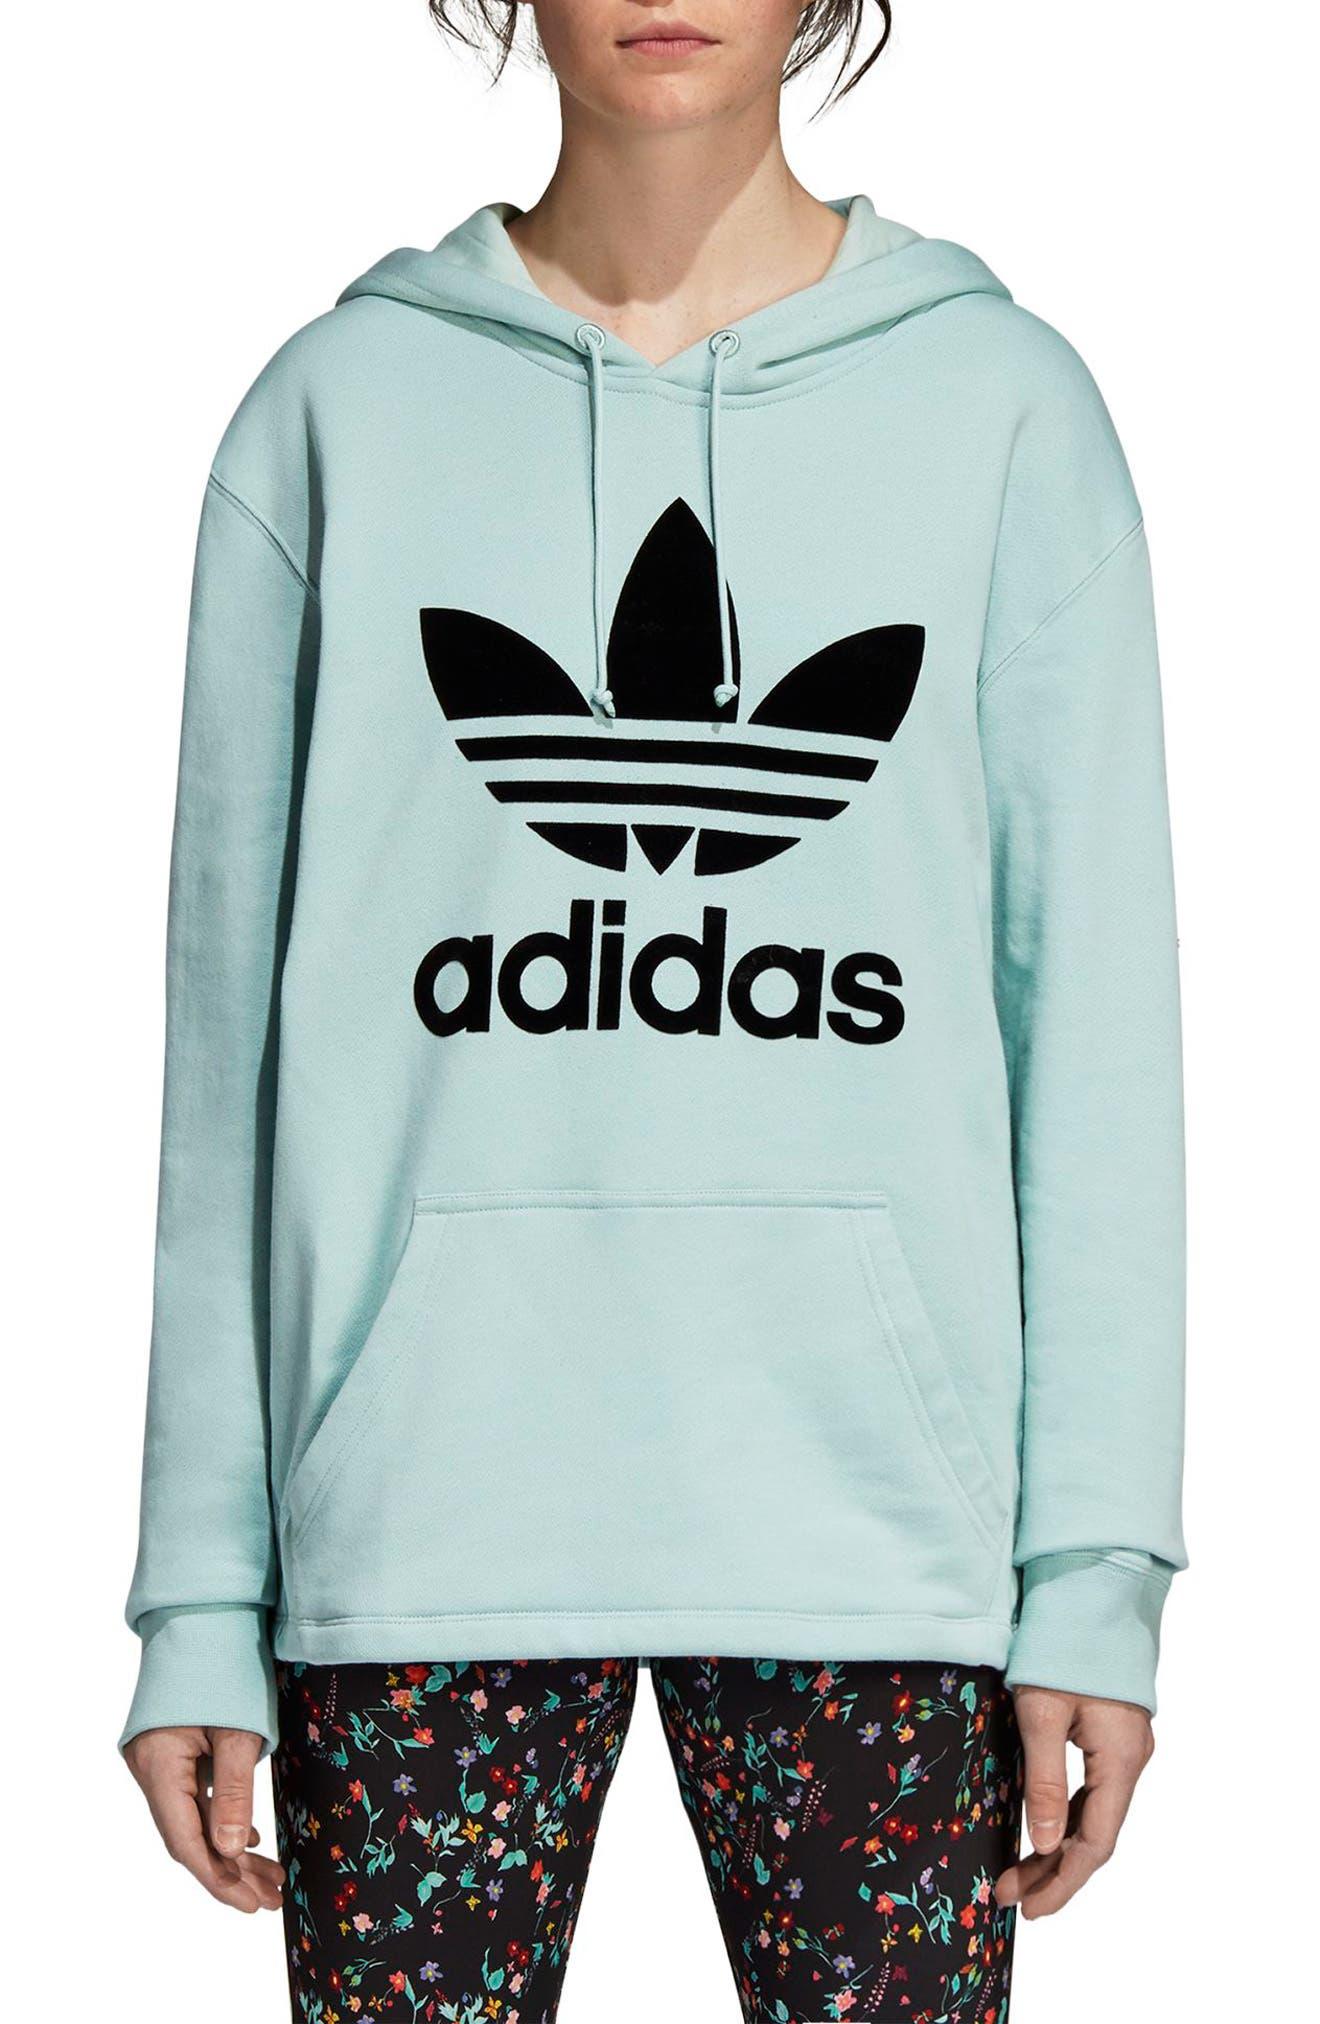 Adidas Originals Trefoil Hoodie, Green